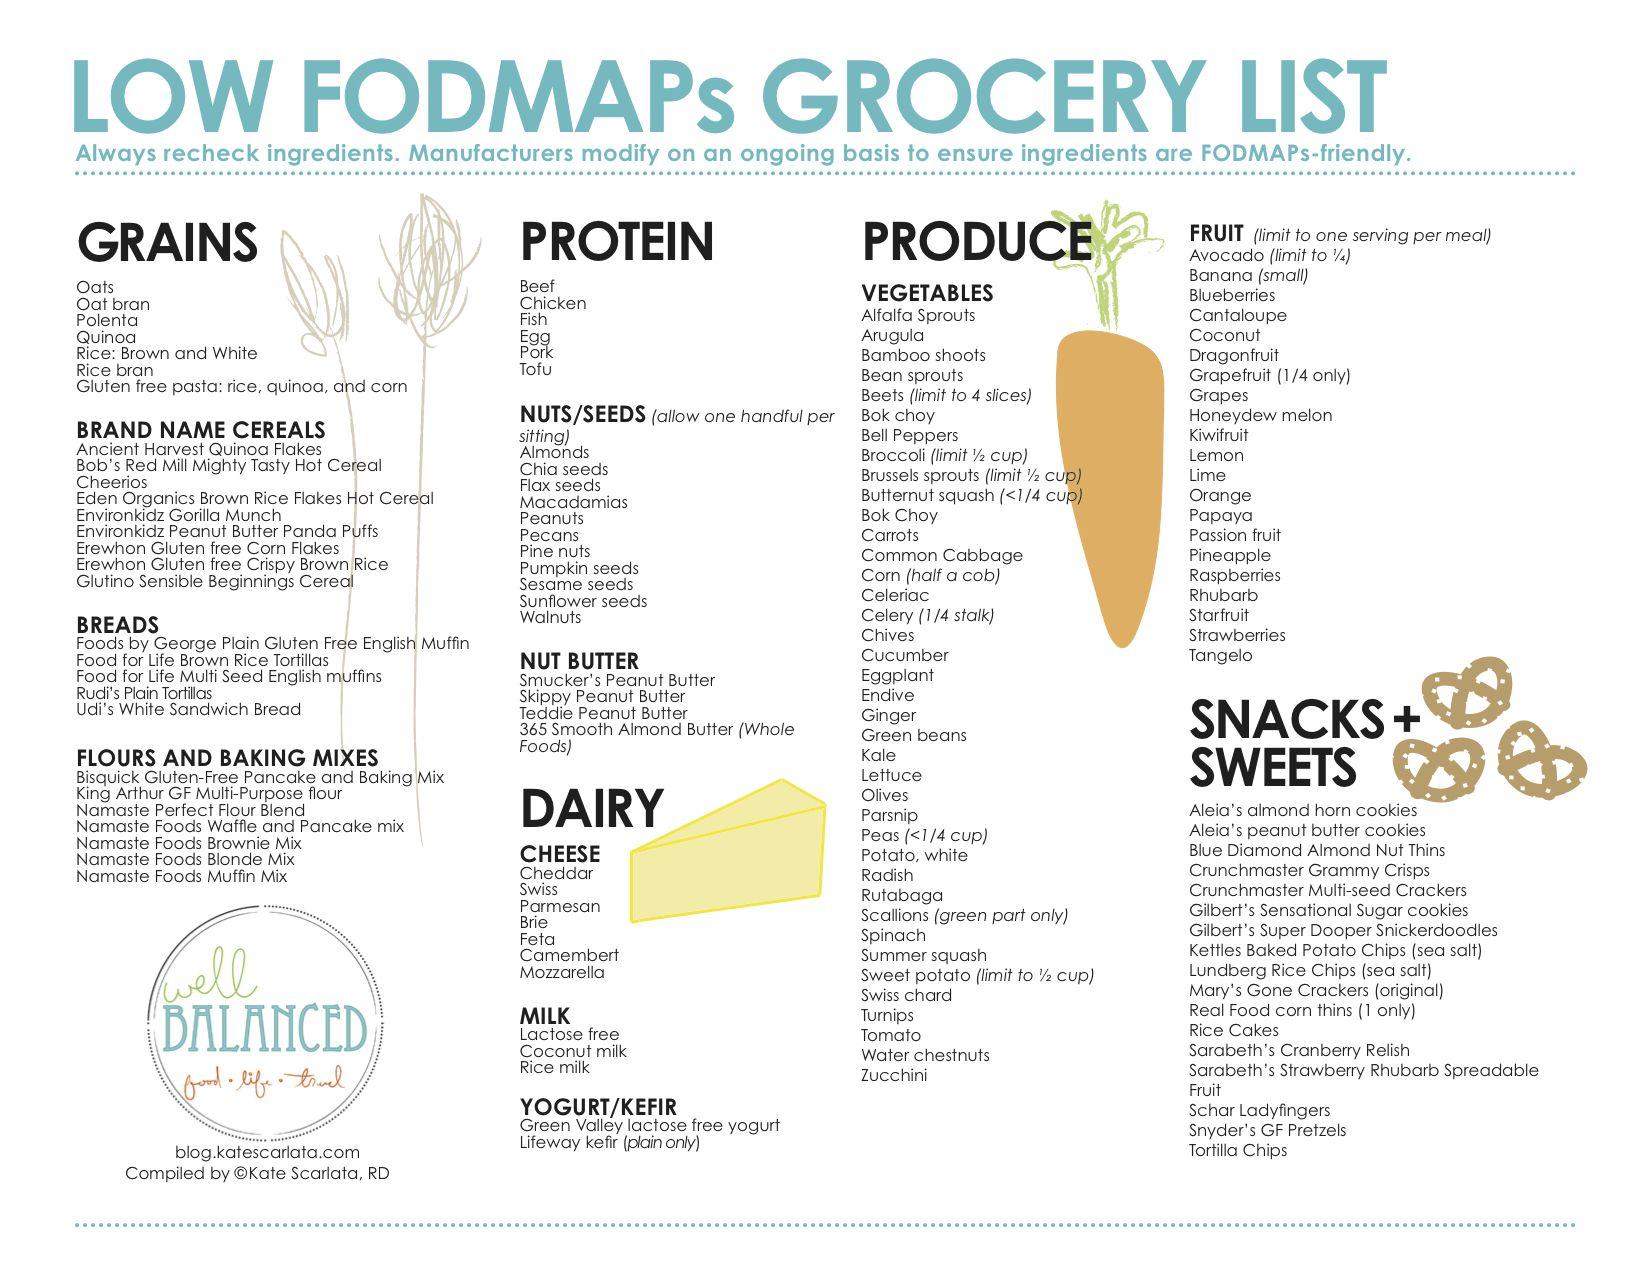 Gallbladder Diet Food List Uk